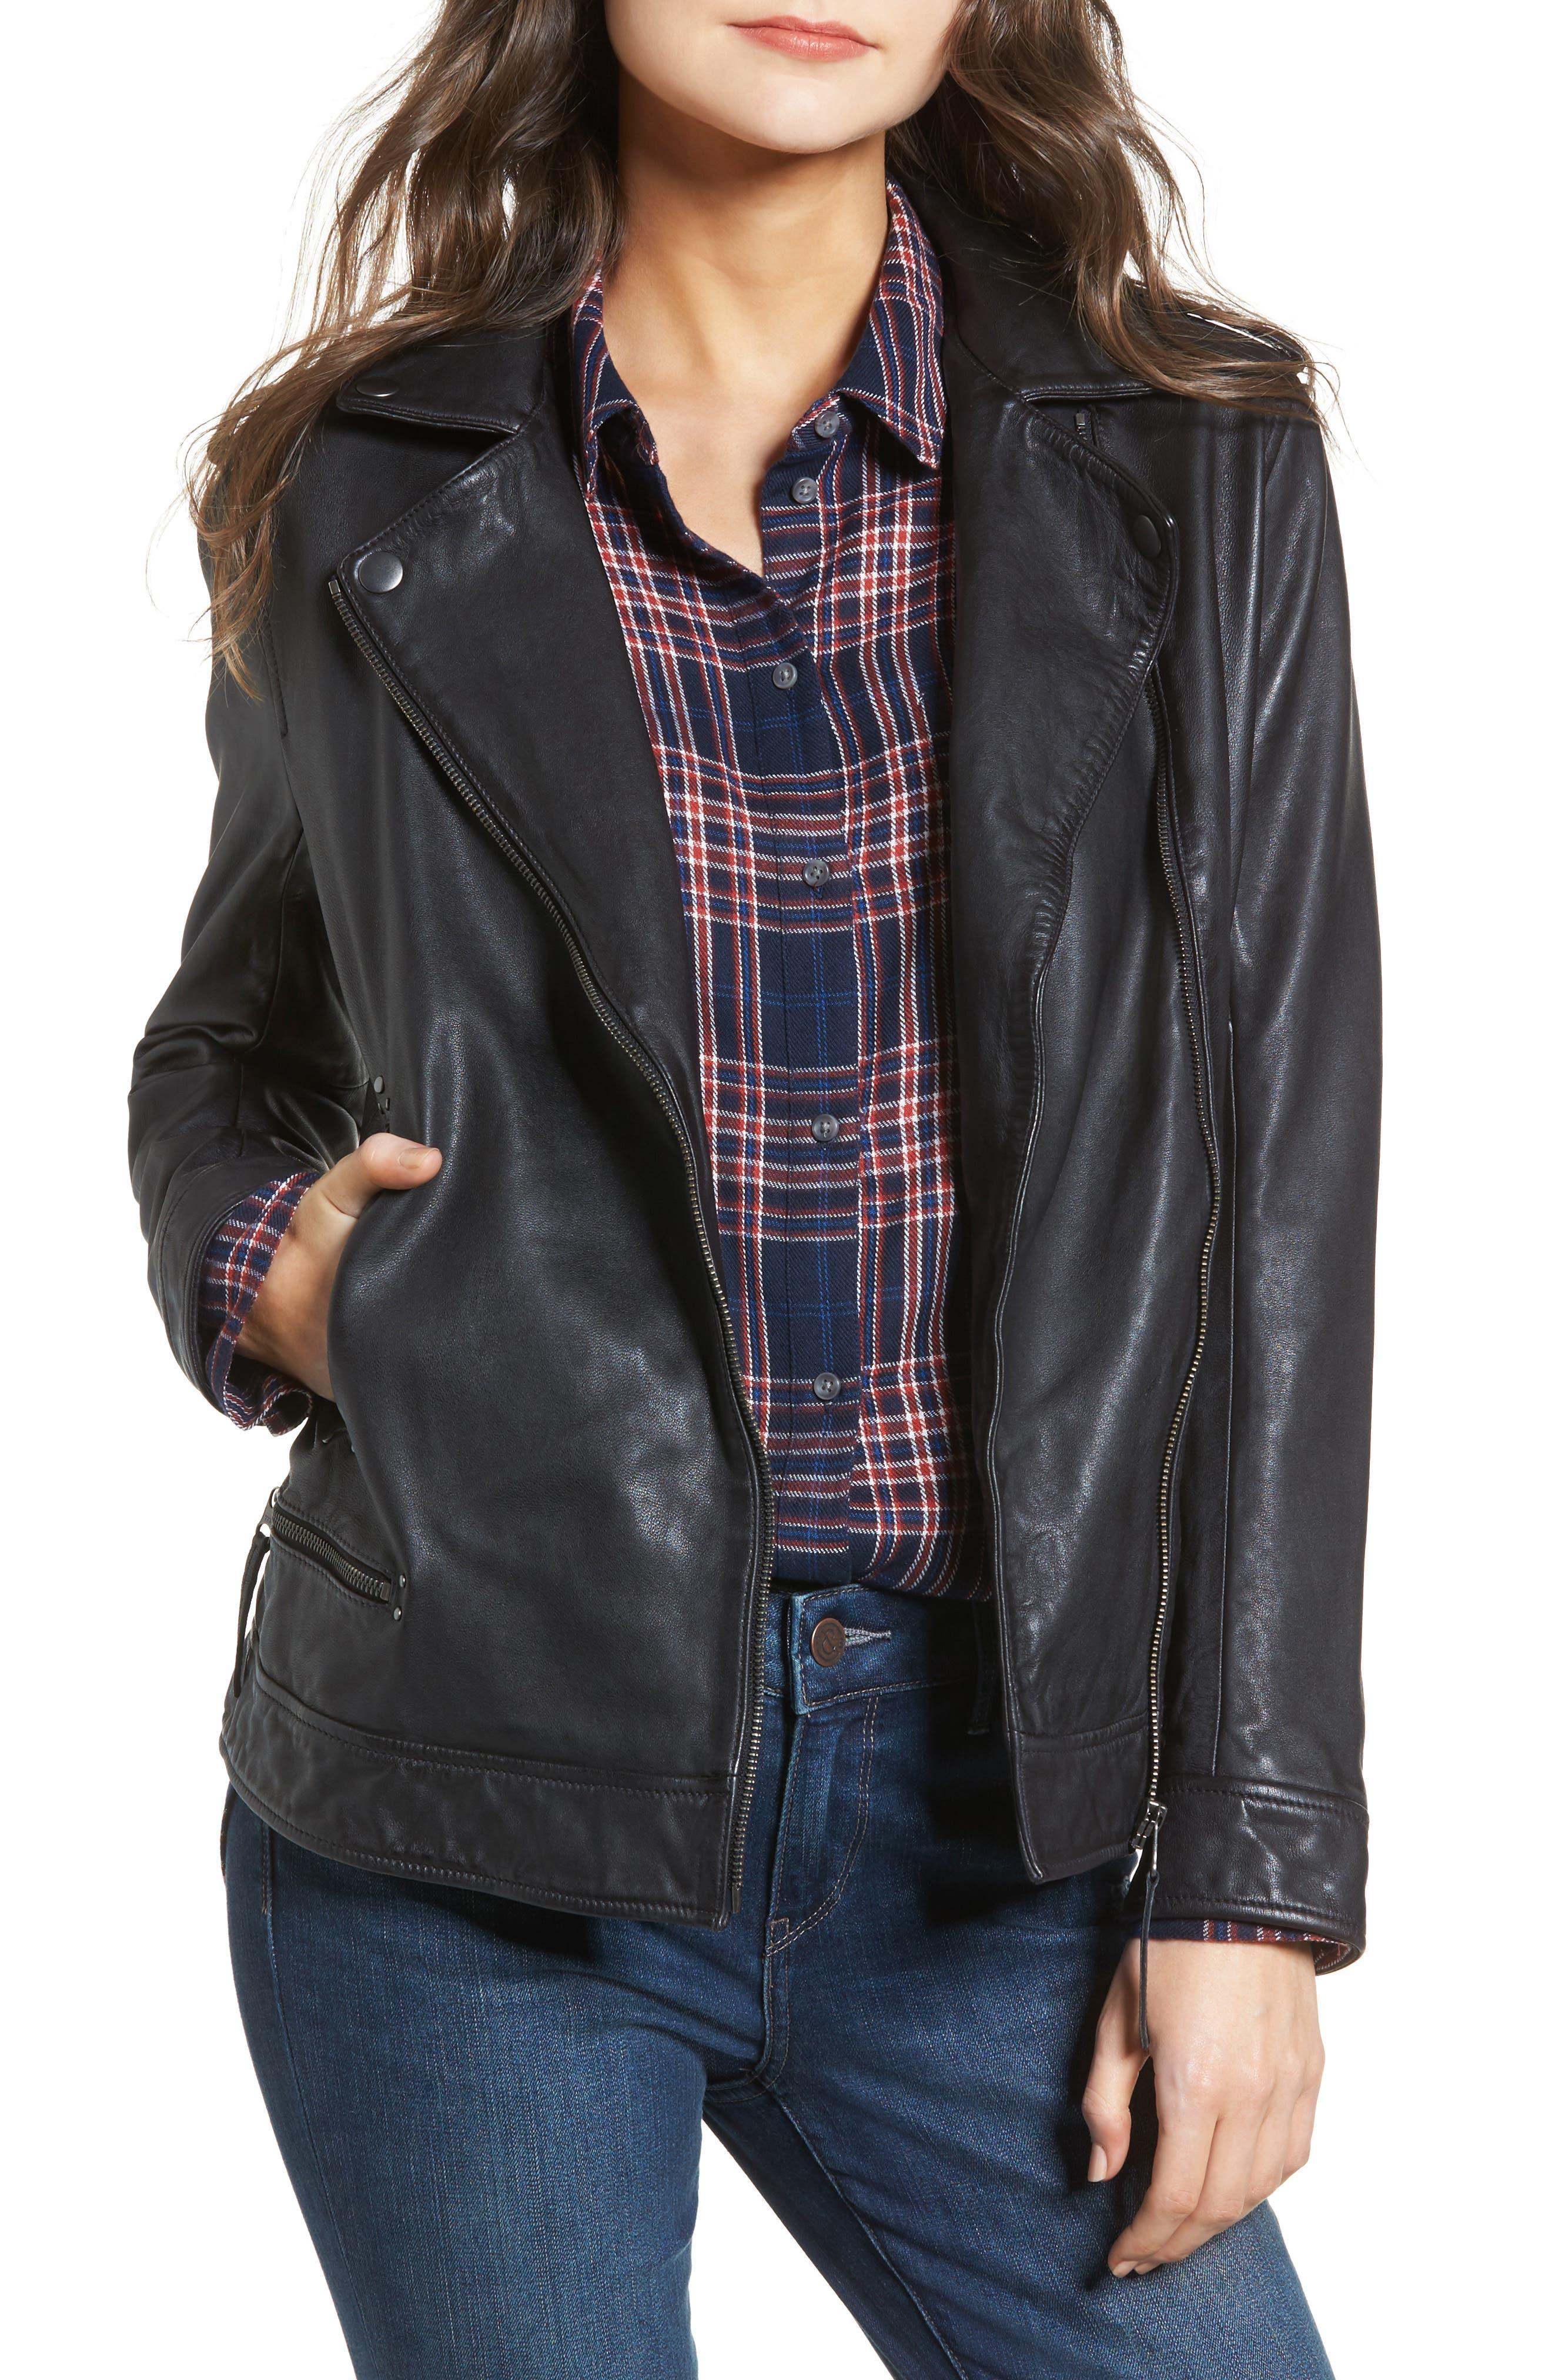 Main Image - Treasure & Bond Studded Leather Jacket